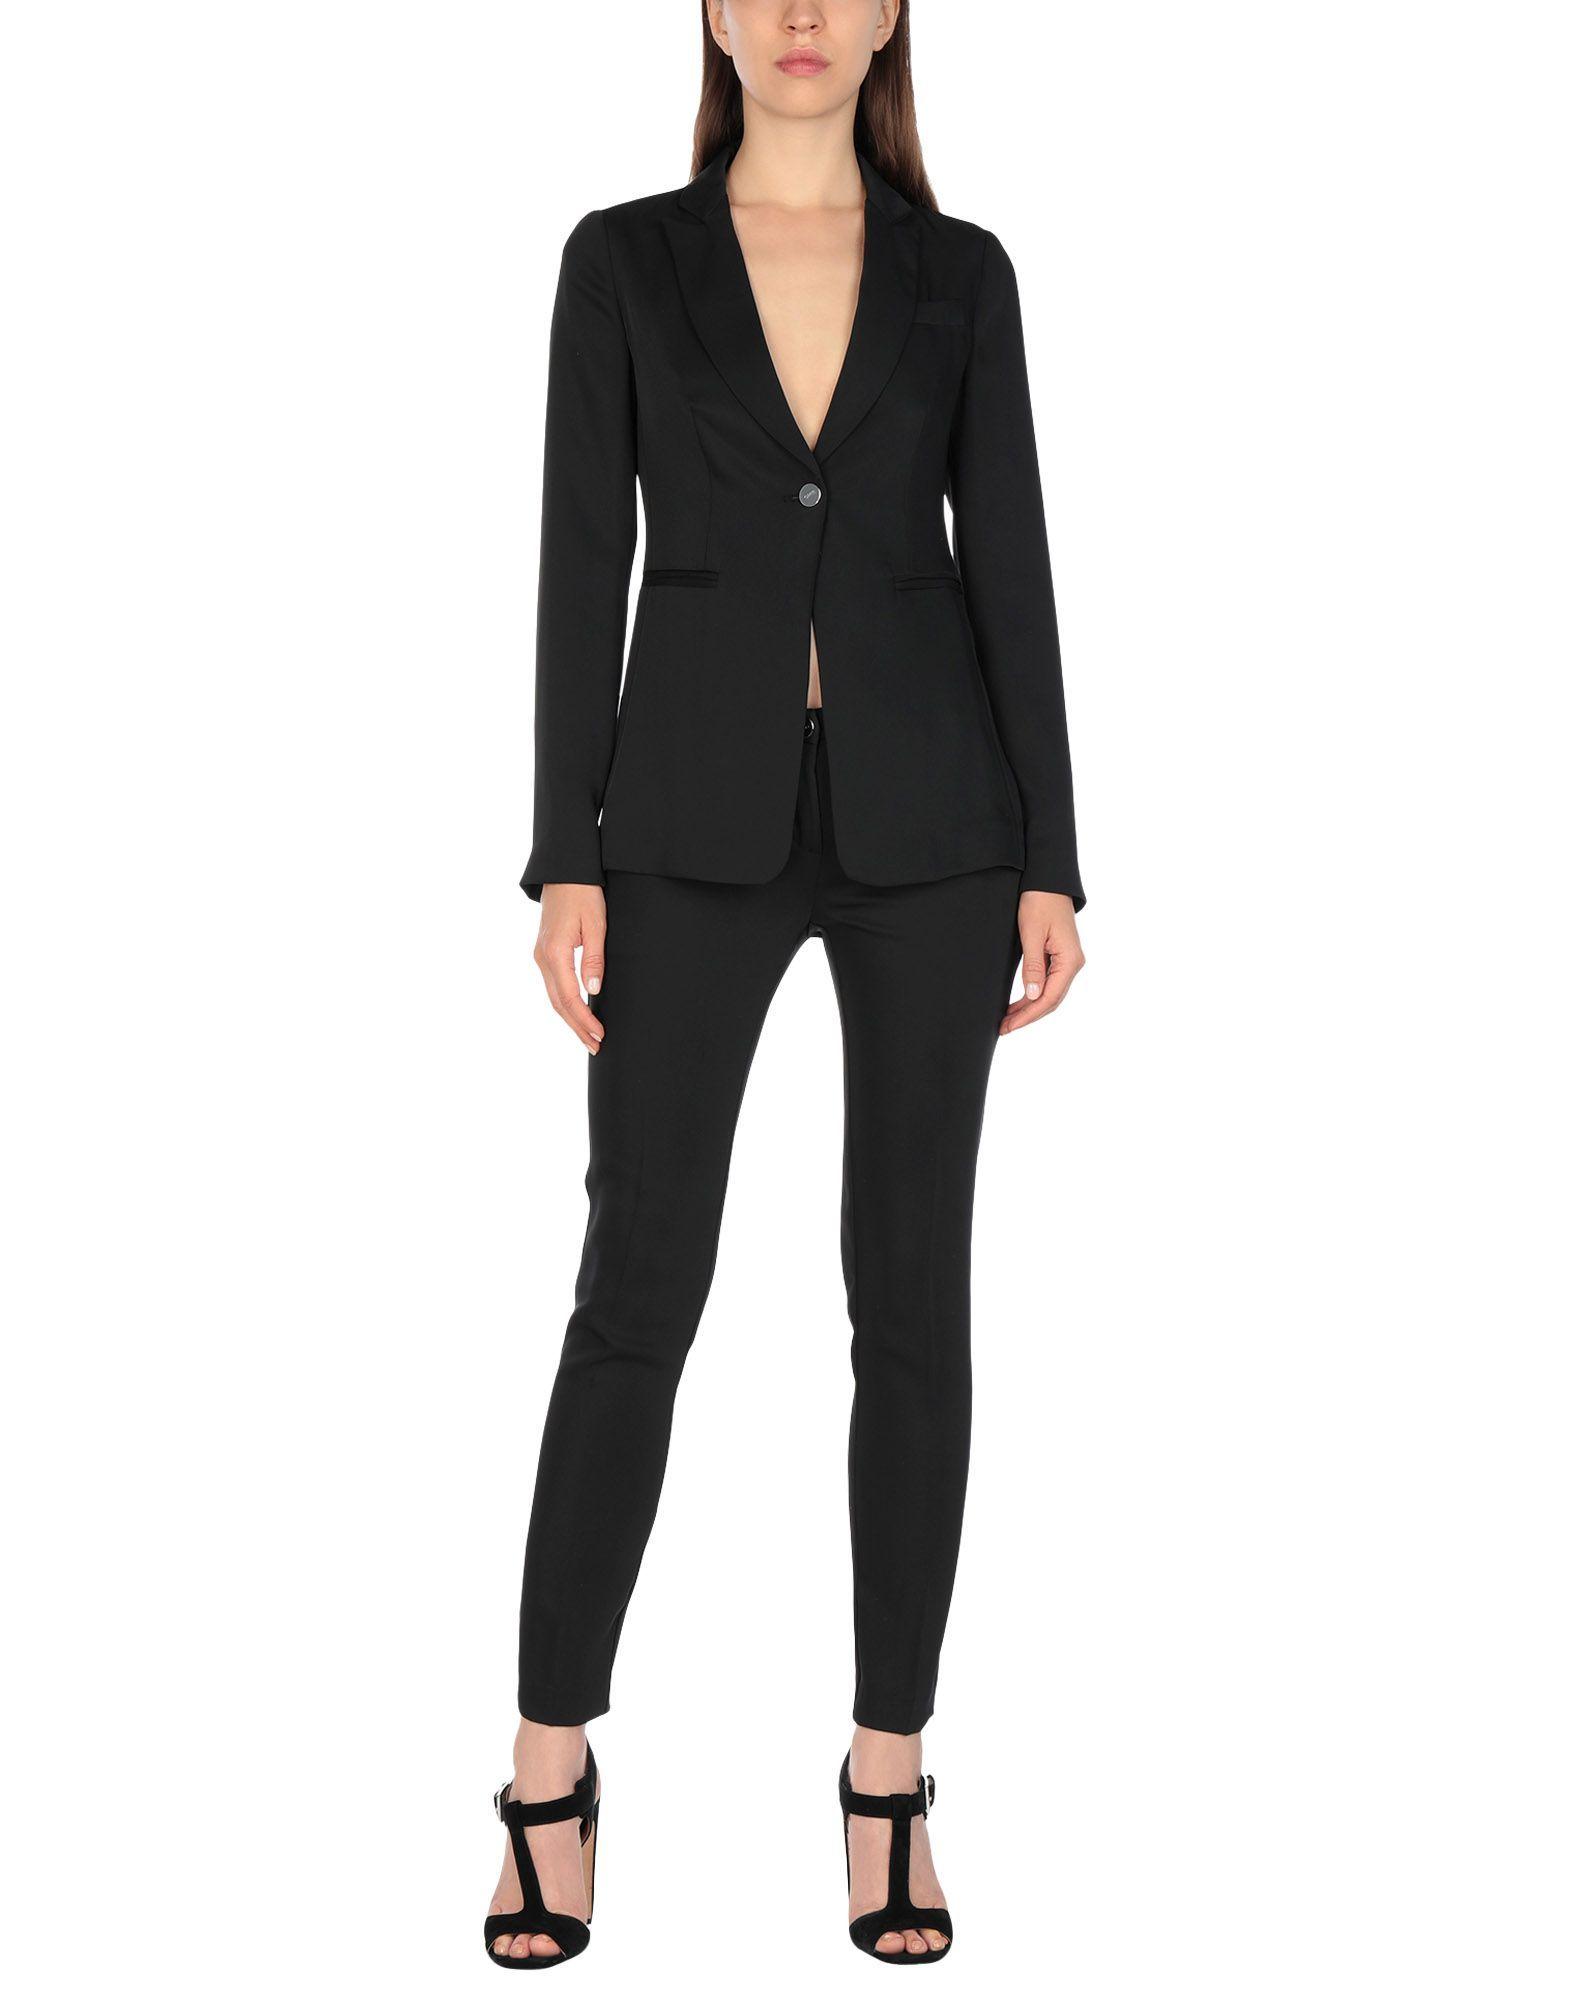 Liu Jo Black Single Breasted Suit